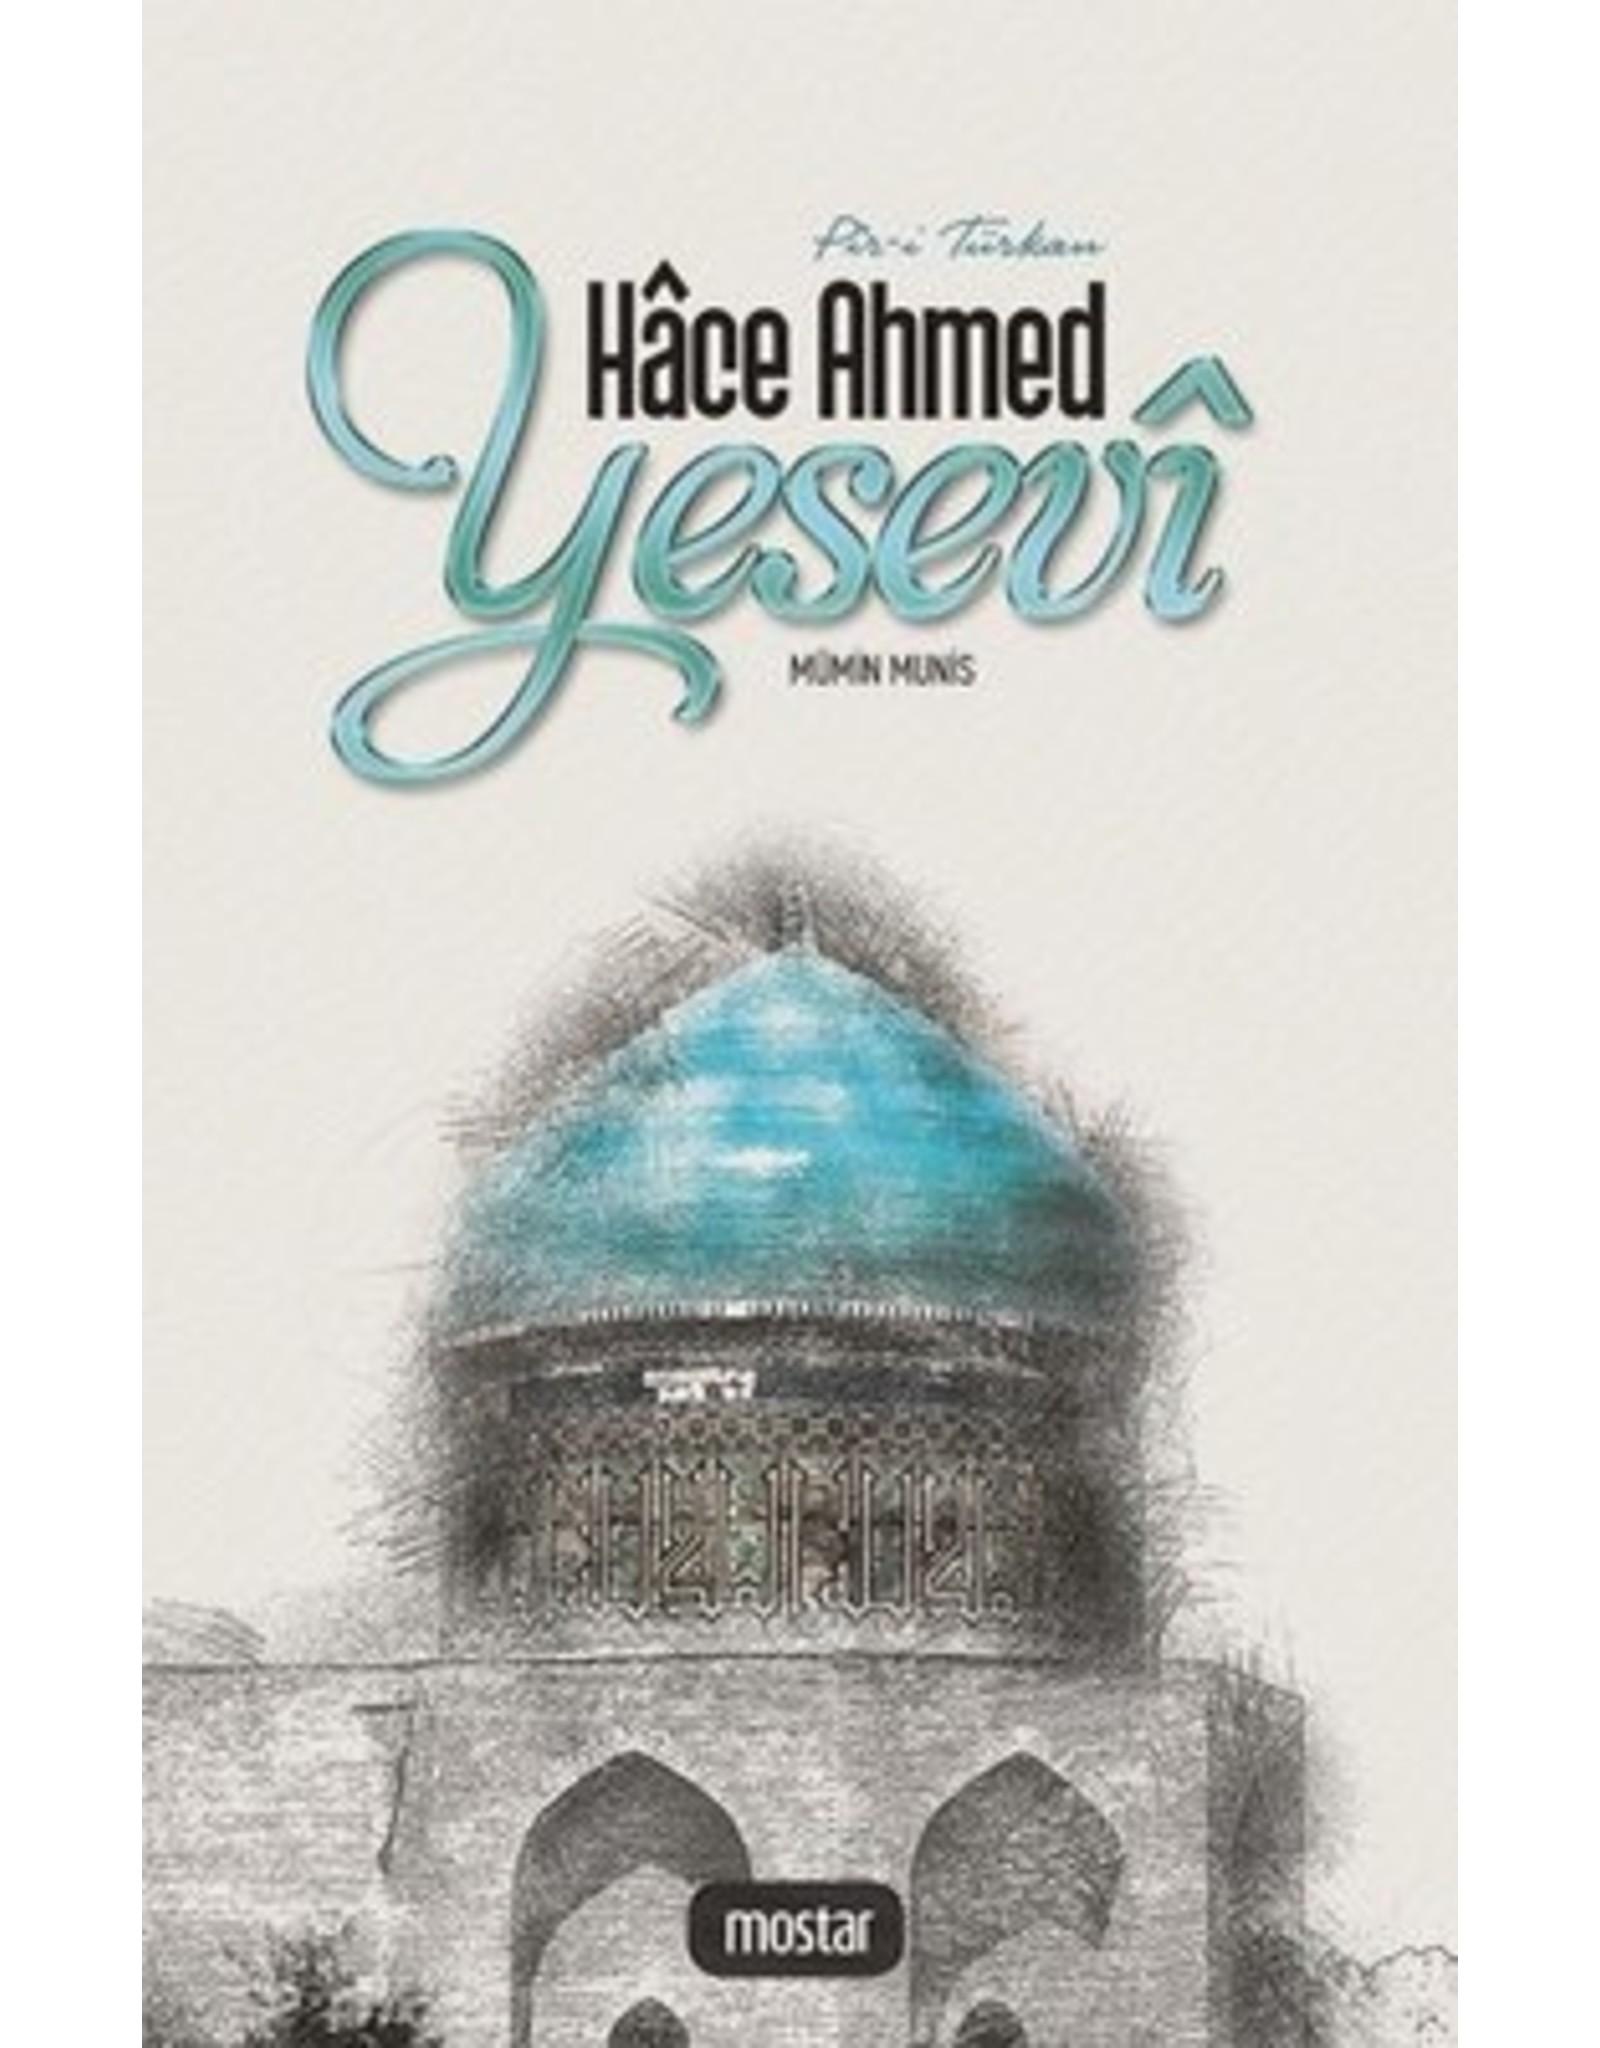 Mümin Munis Piri Türkkan Hace Ahmed Yesevi